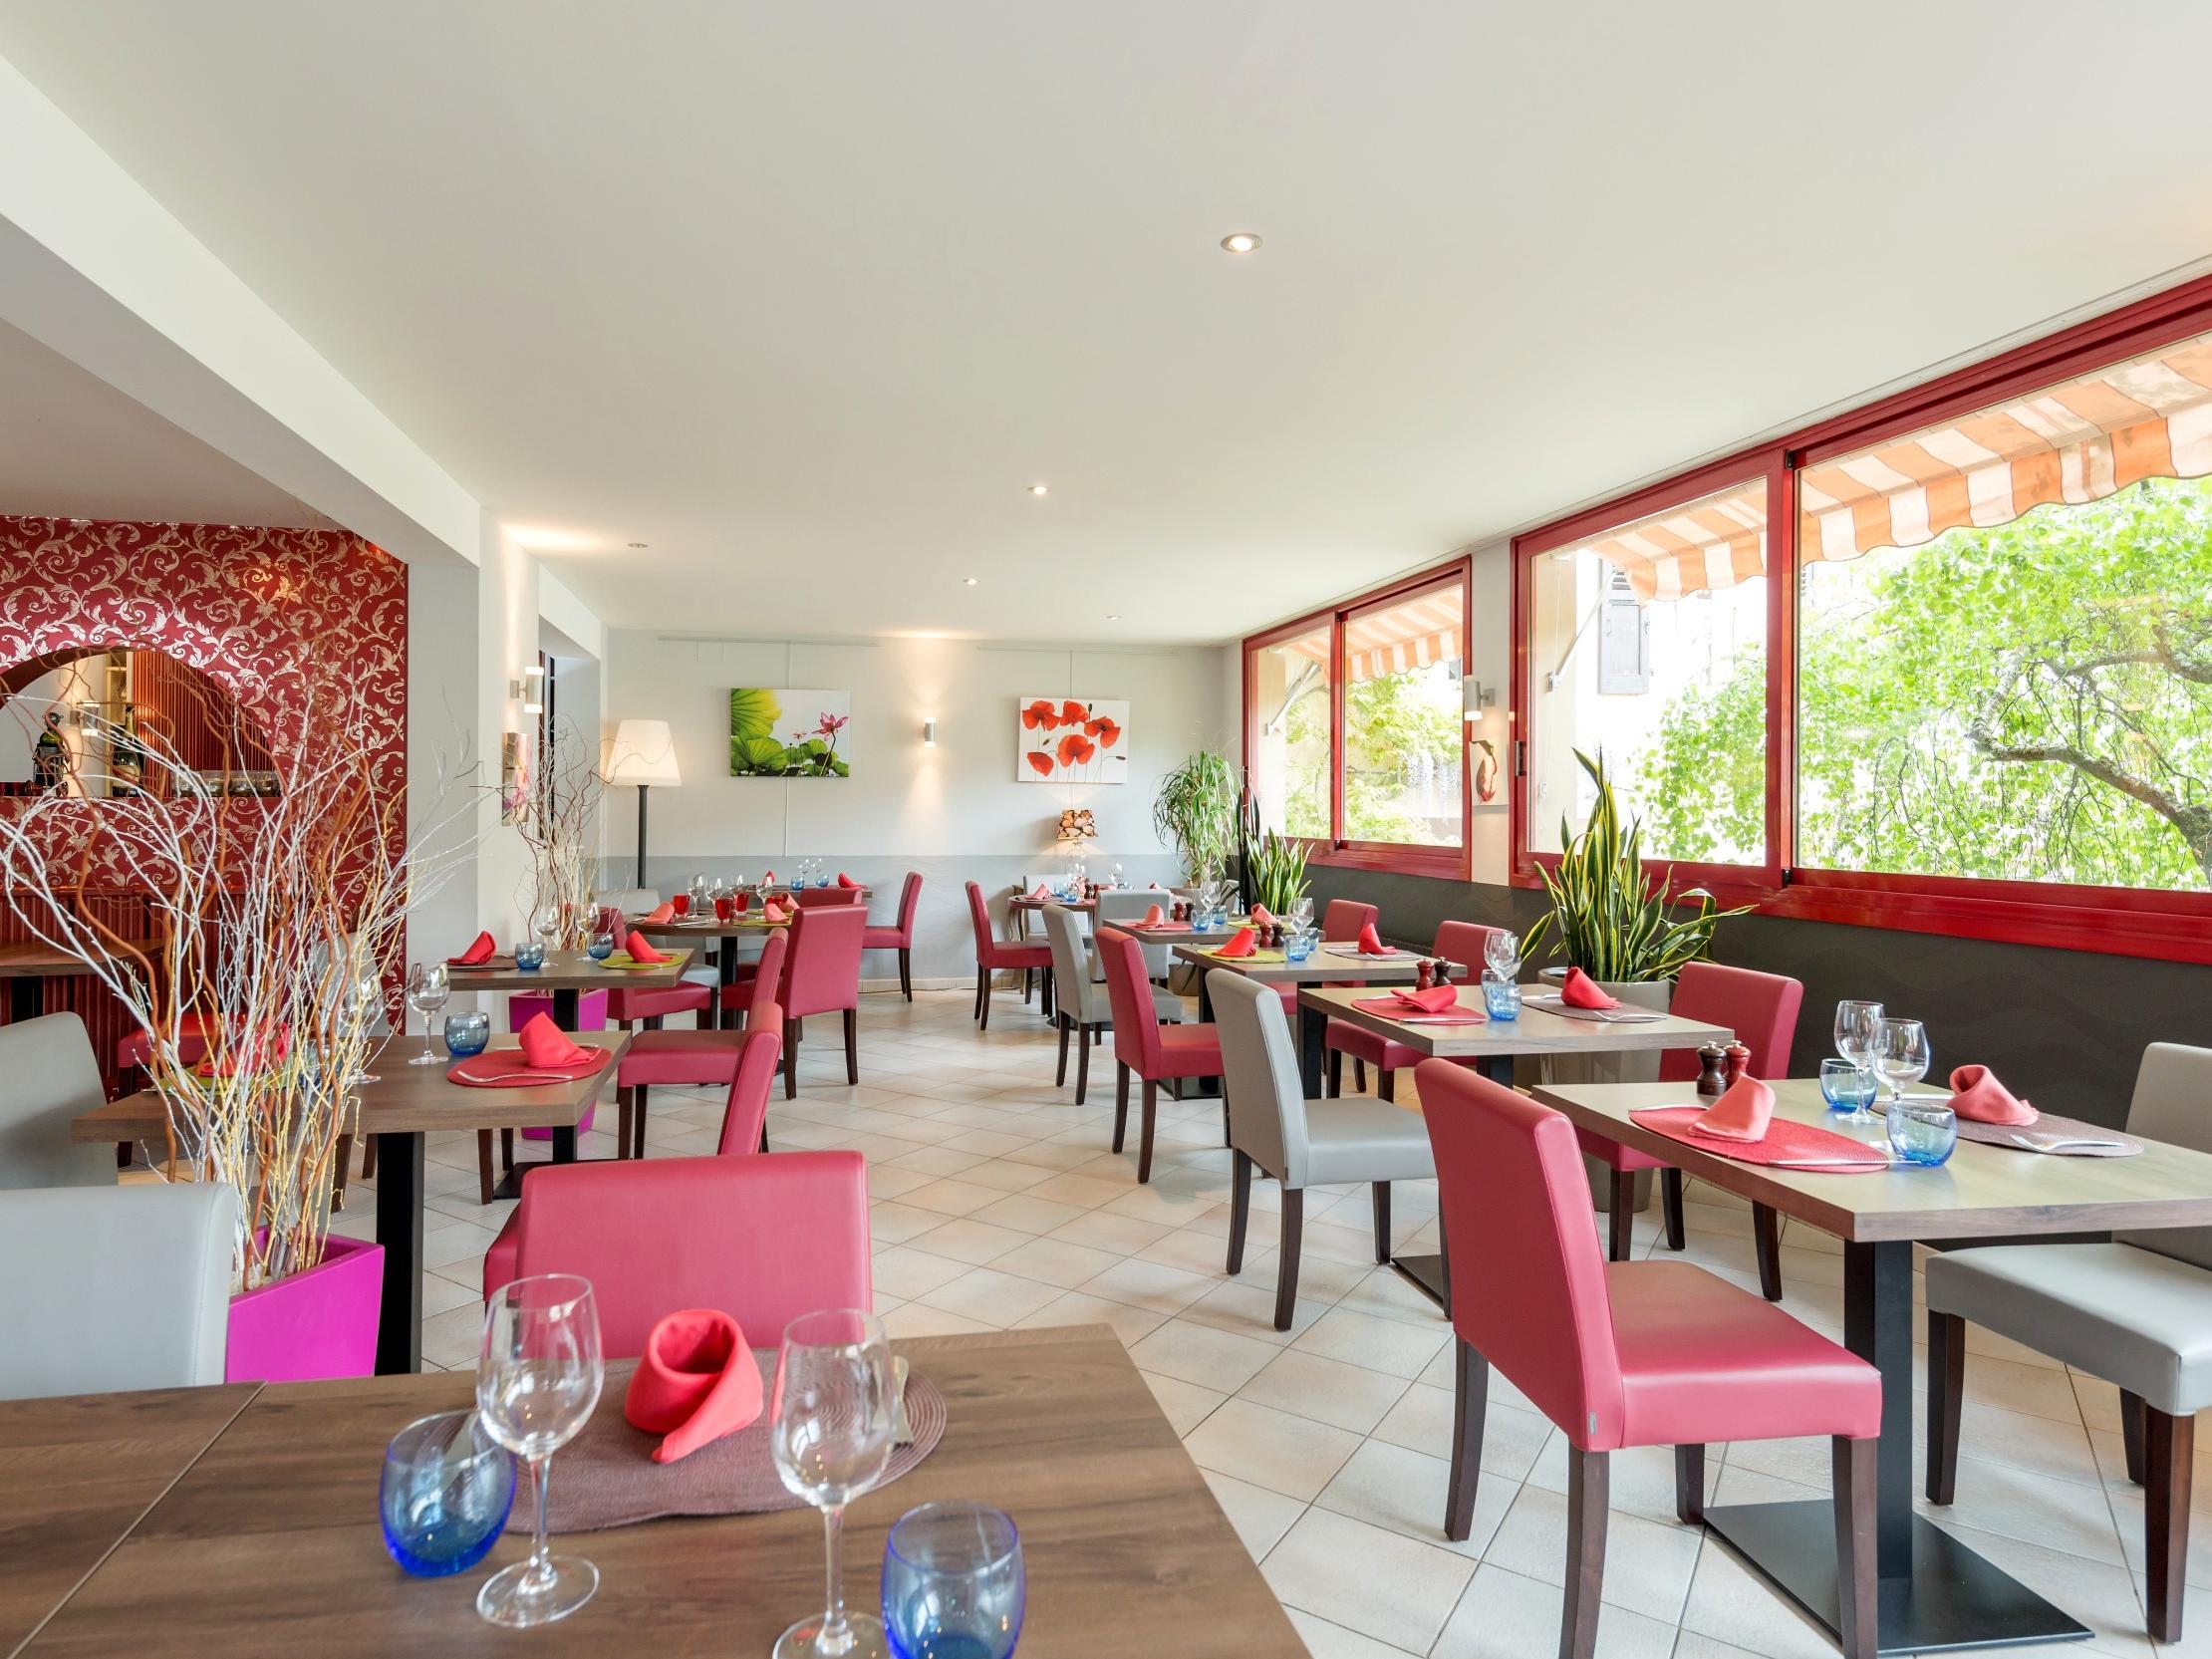 Restaurant divonne les bains la terrasse fleurie for S bains restaurant